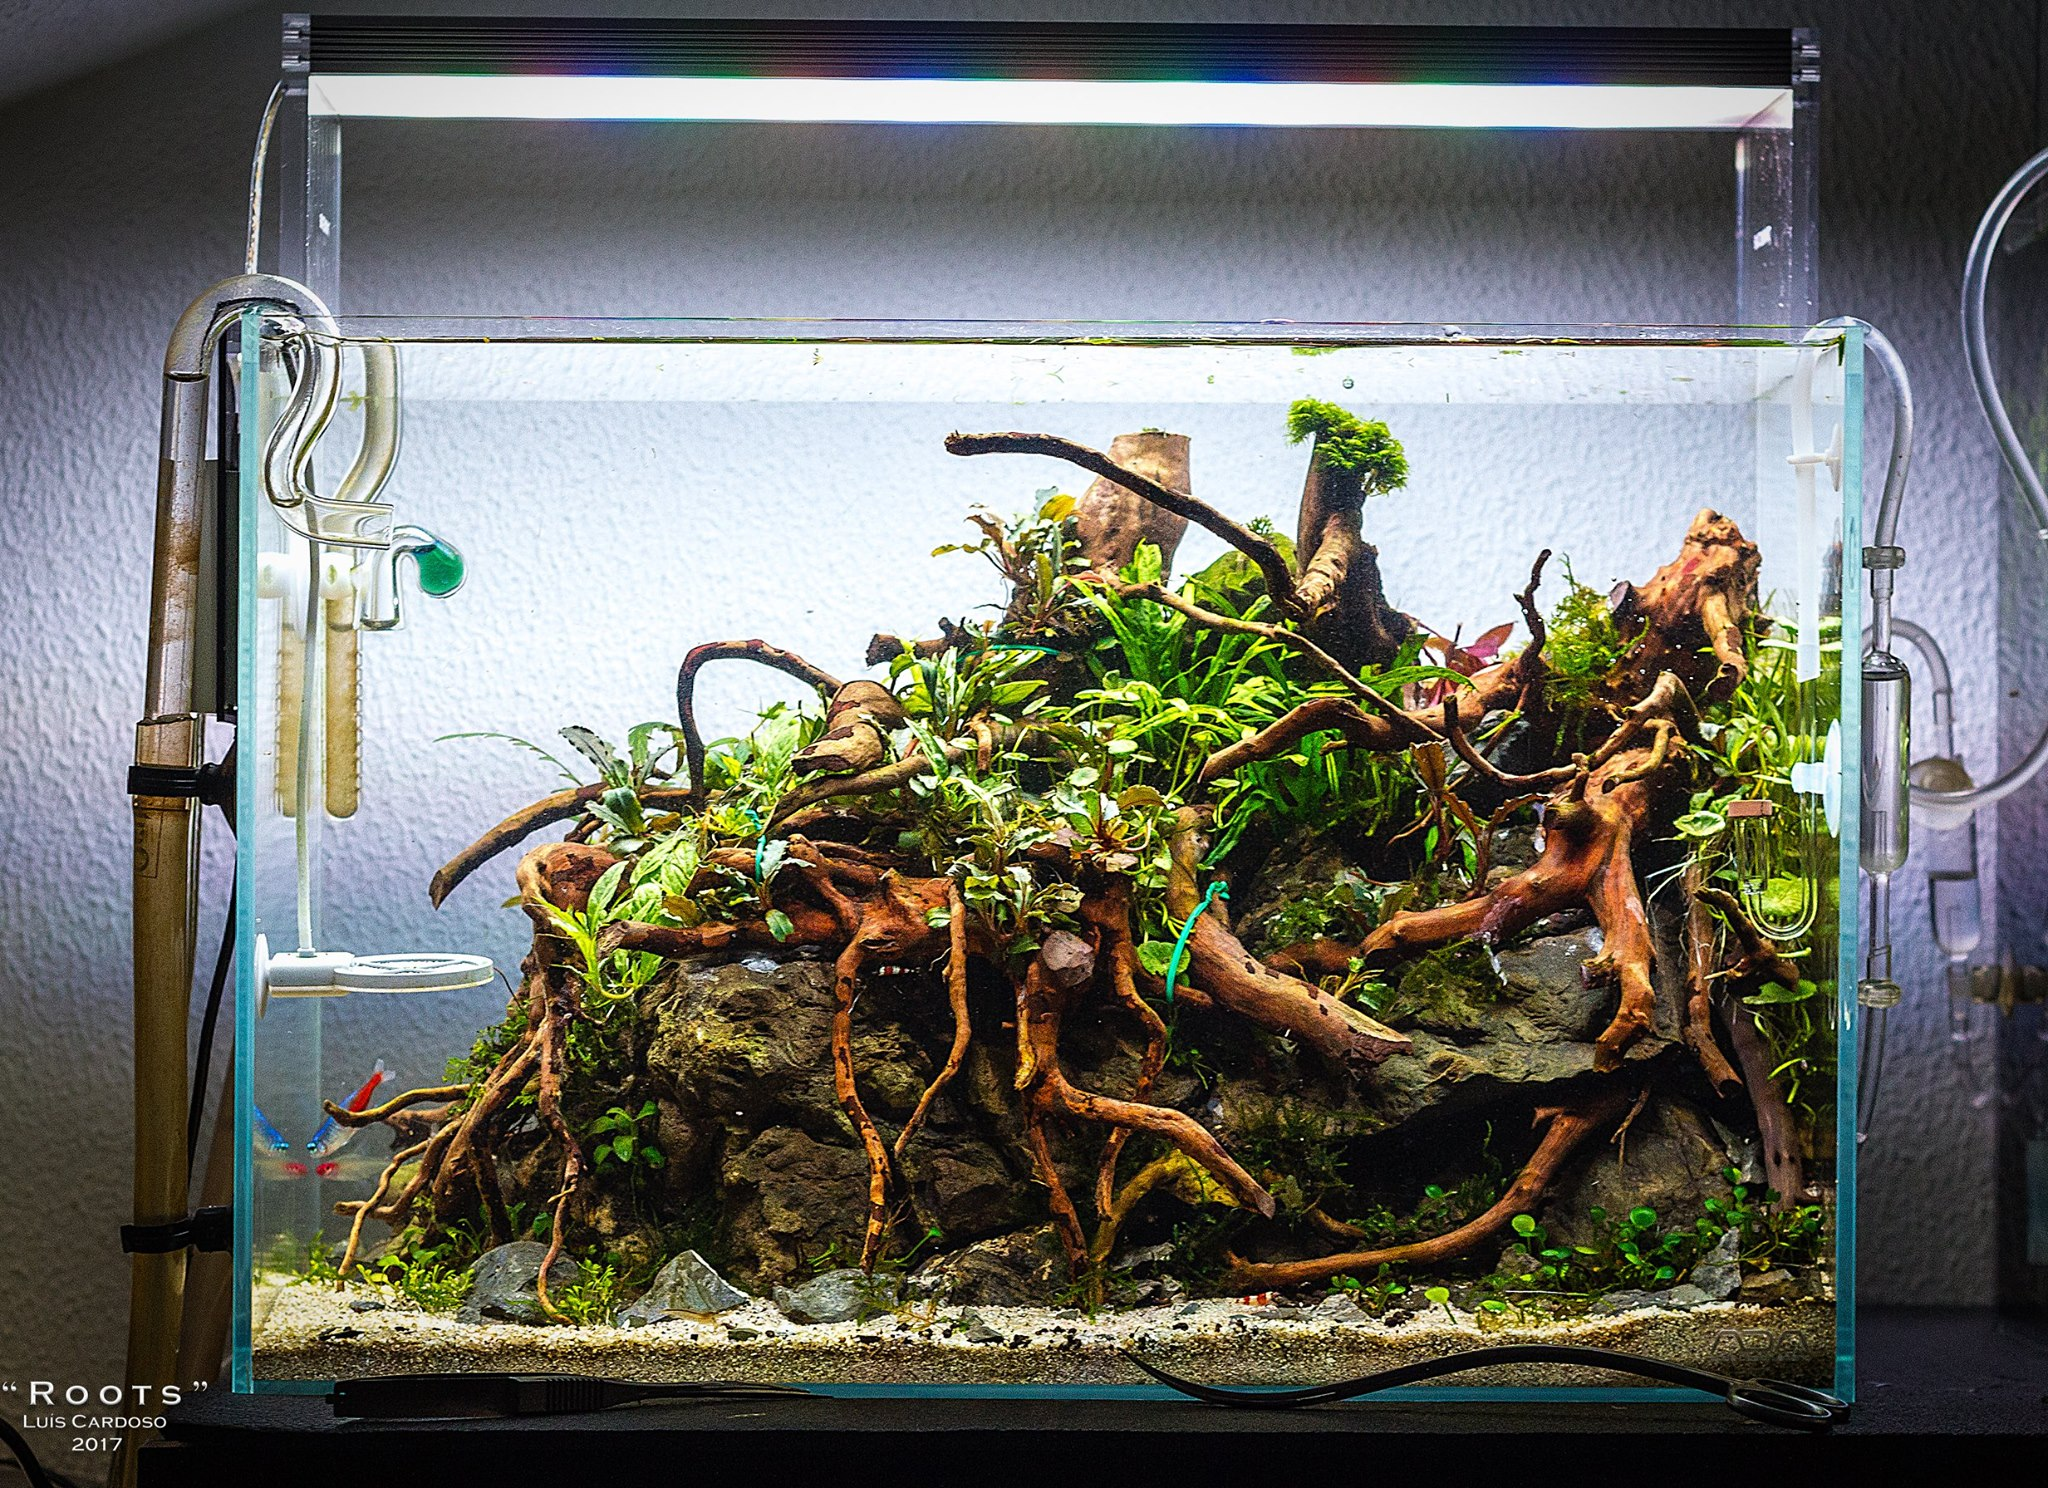 Roots - Luis Cardoso